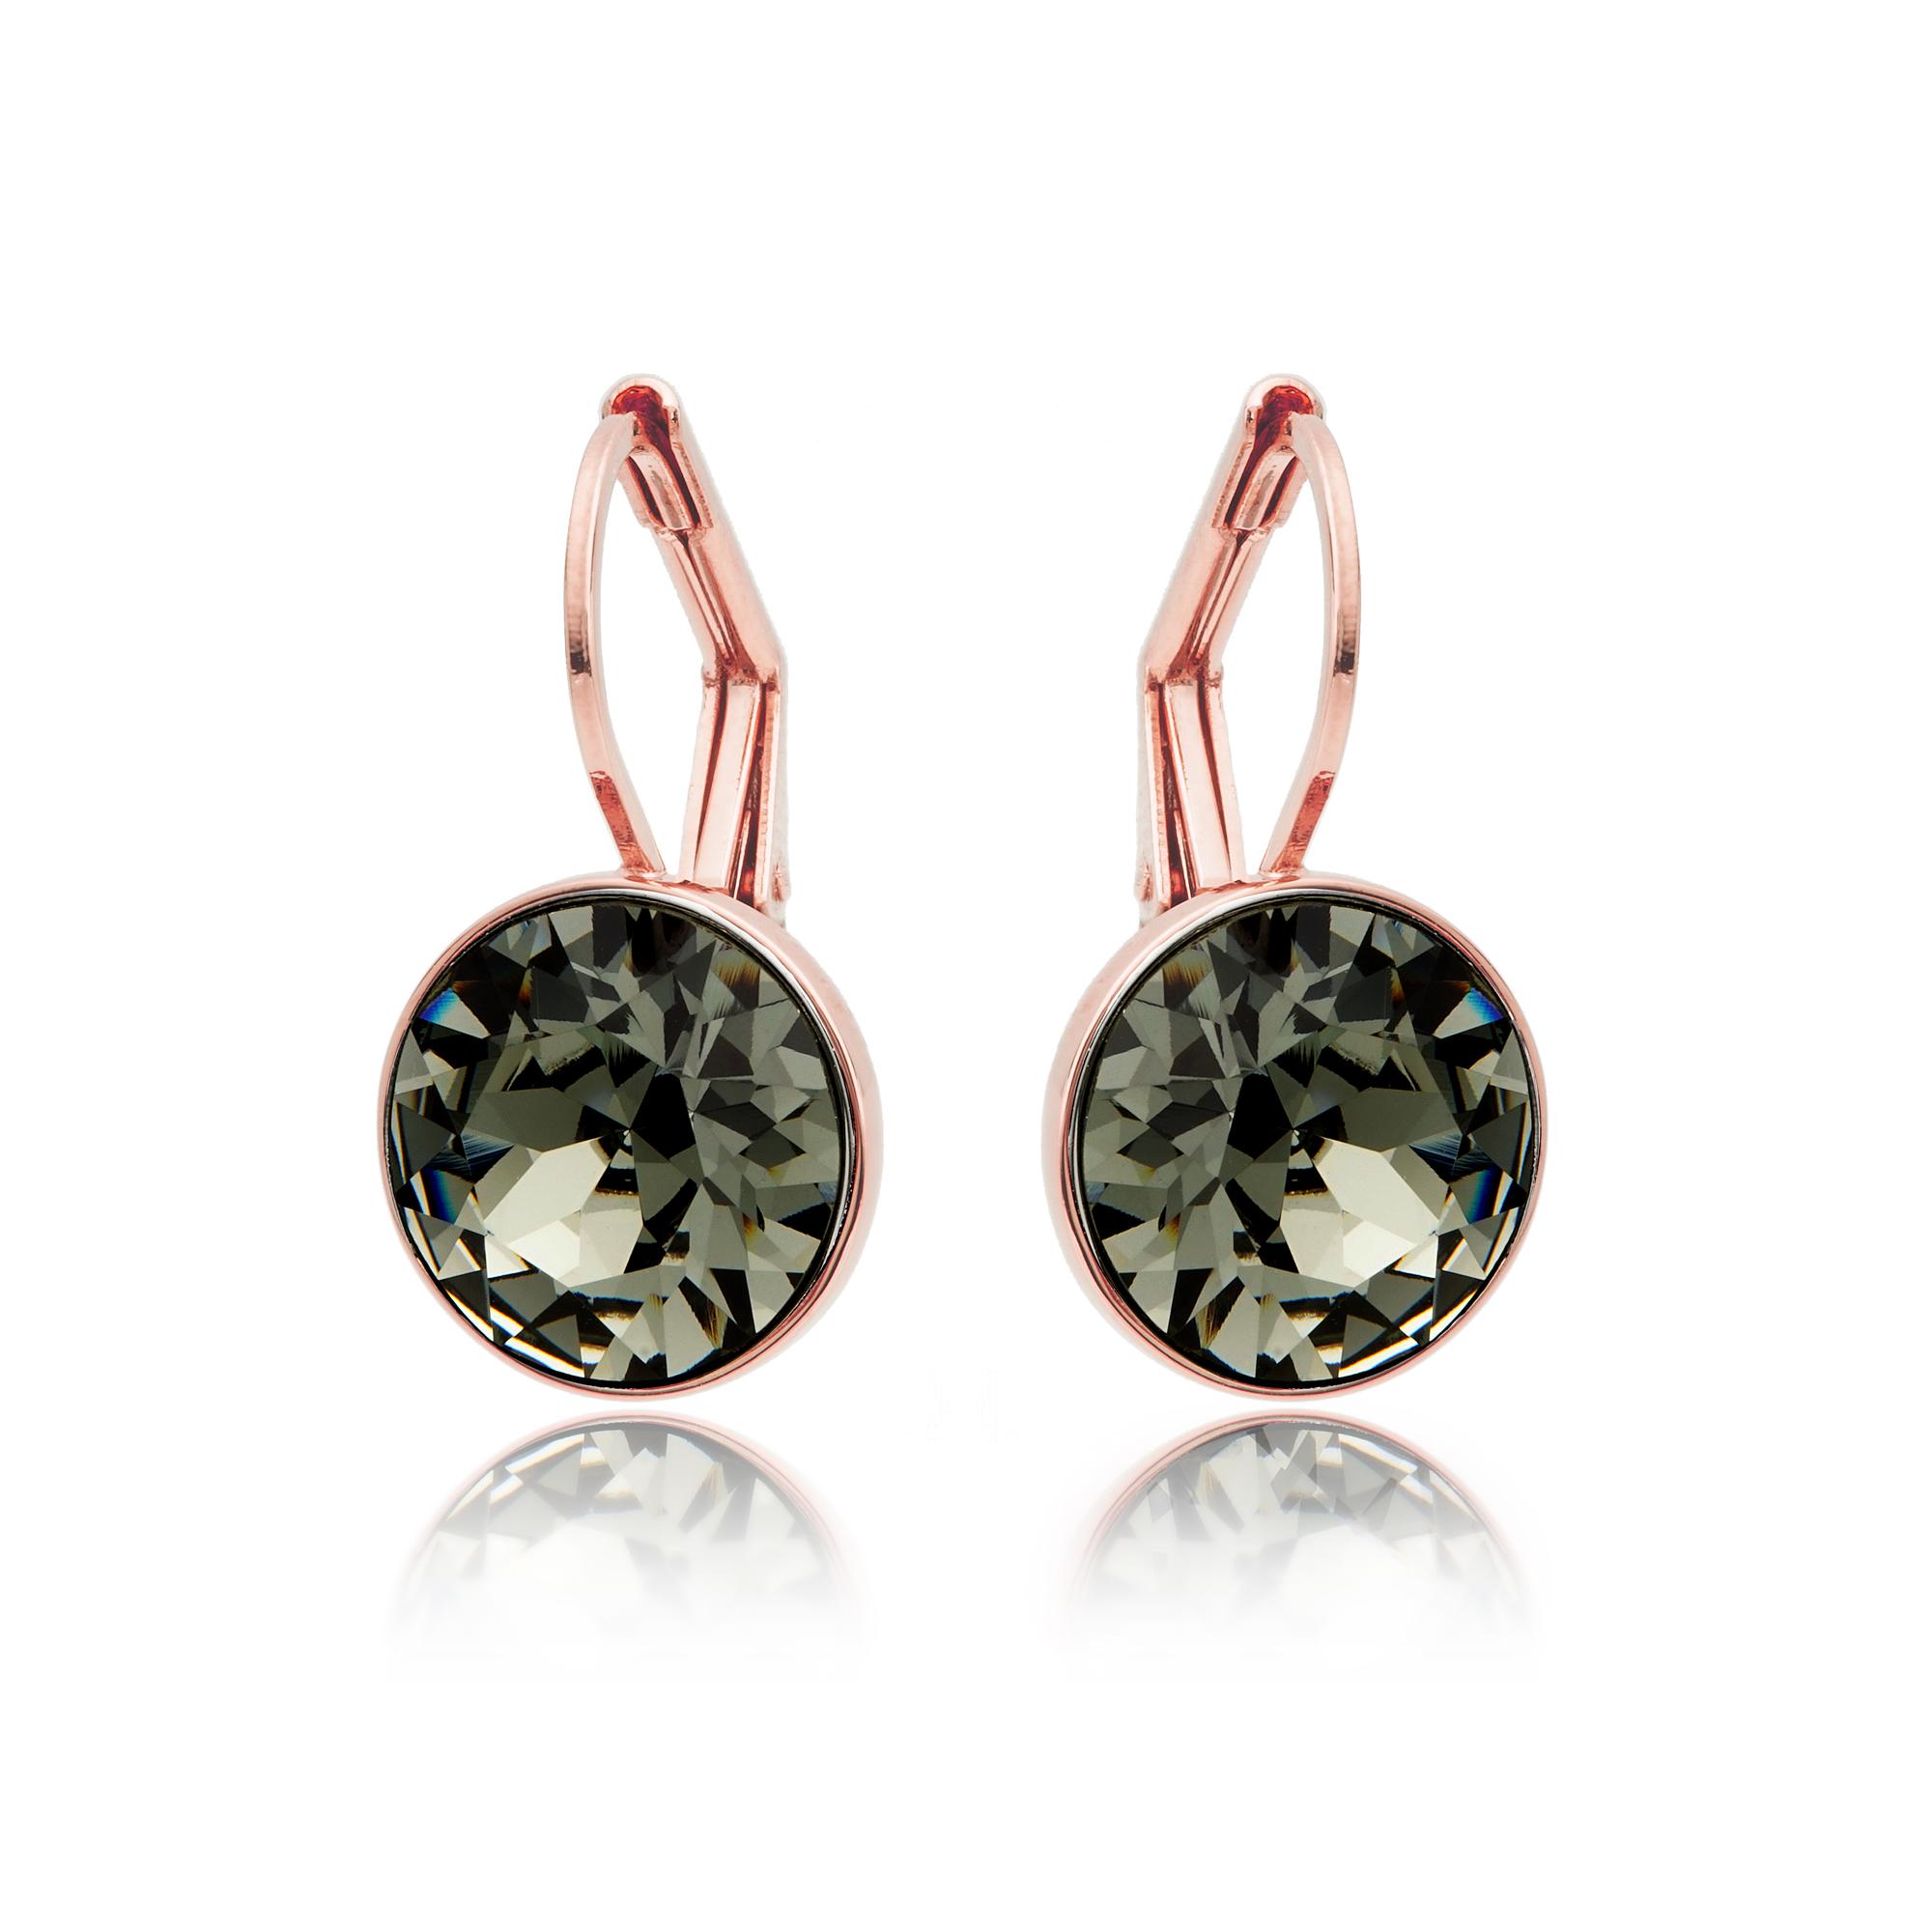 3e90b336c Bella Earrings with 4 Carat Swarovski Black Diamond Crystals Rose Gold  Plated